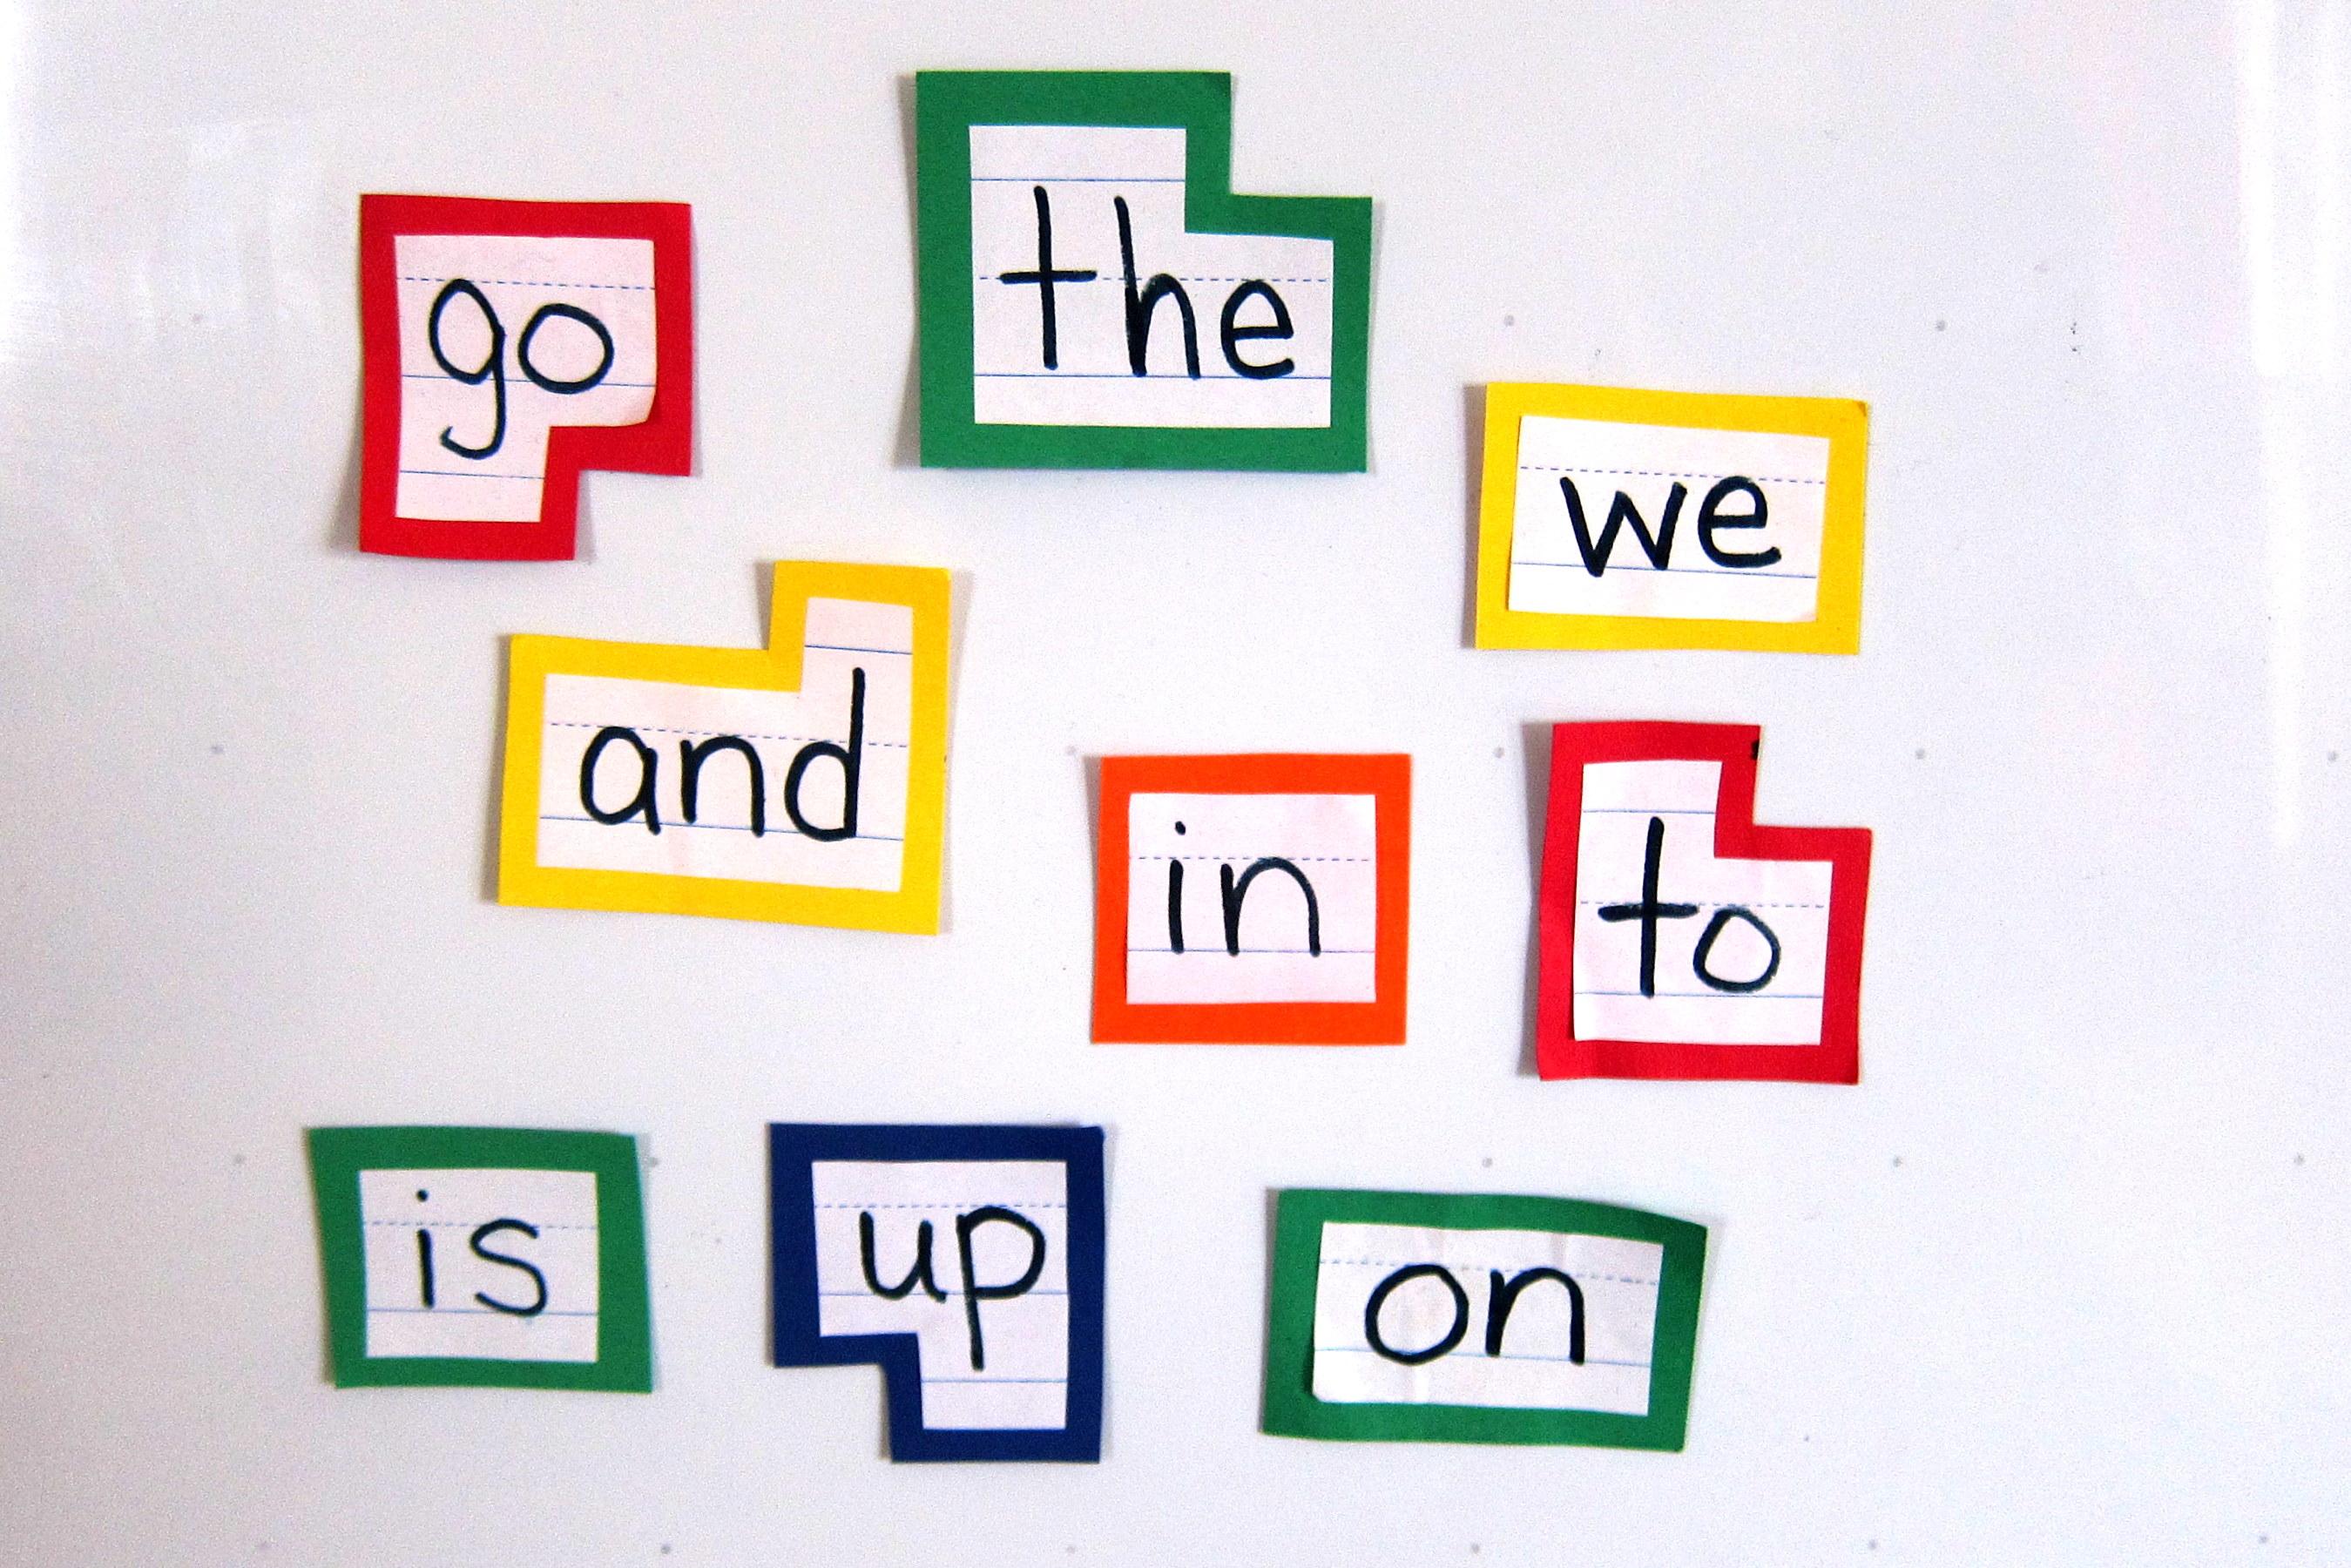 Sight Word Clip Art A New Sight Word-Sight Word Clip Art A New Sight Word-19